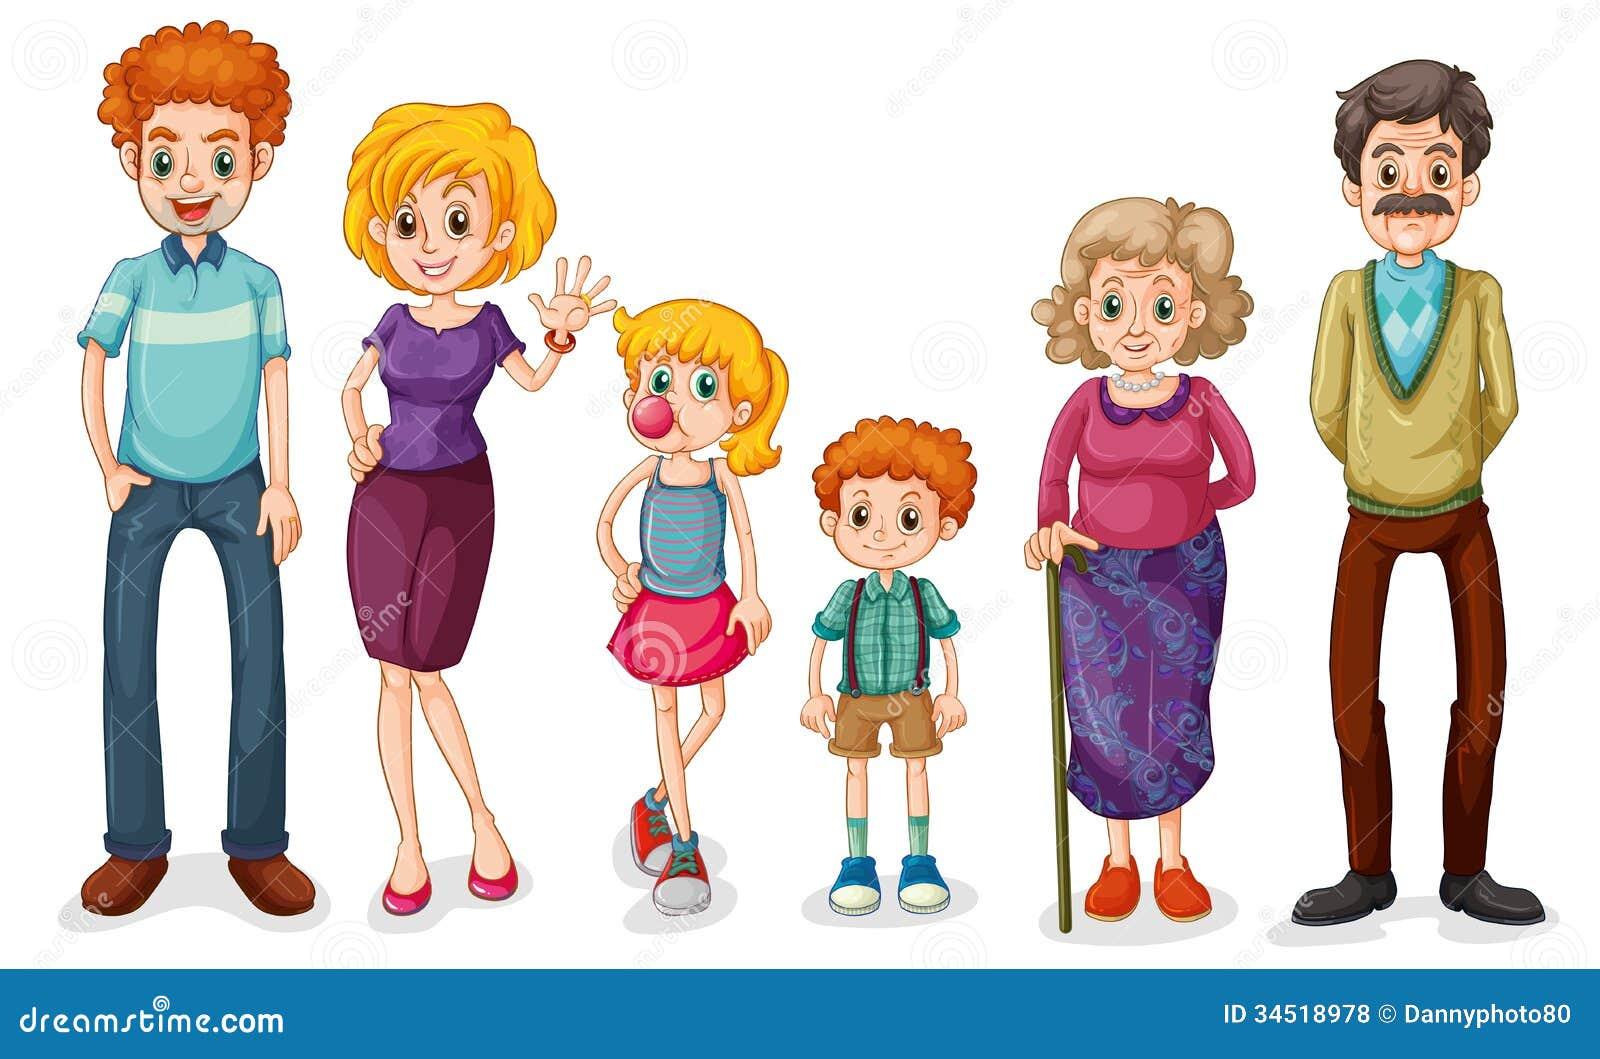 Big Happy Family Royalty Free Stock Photos - Image: 34518978